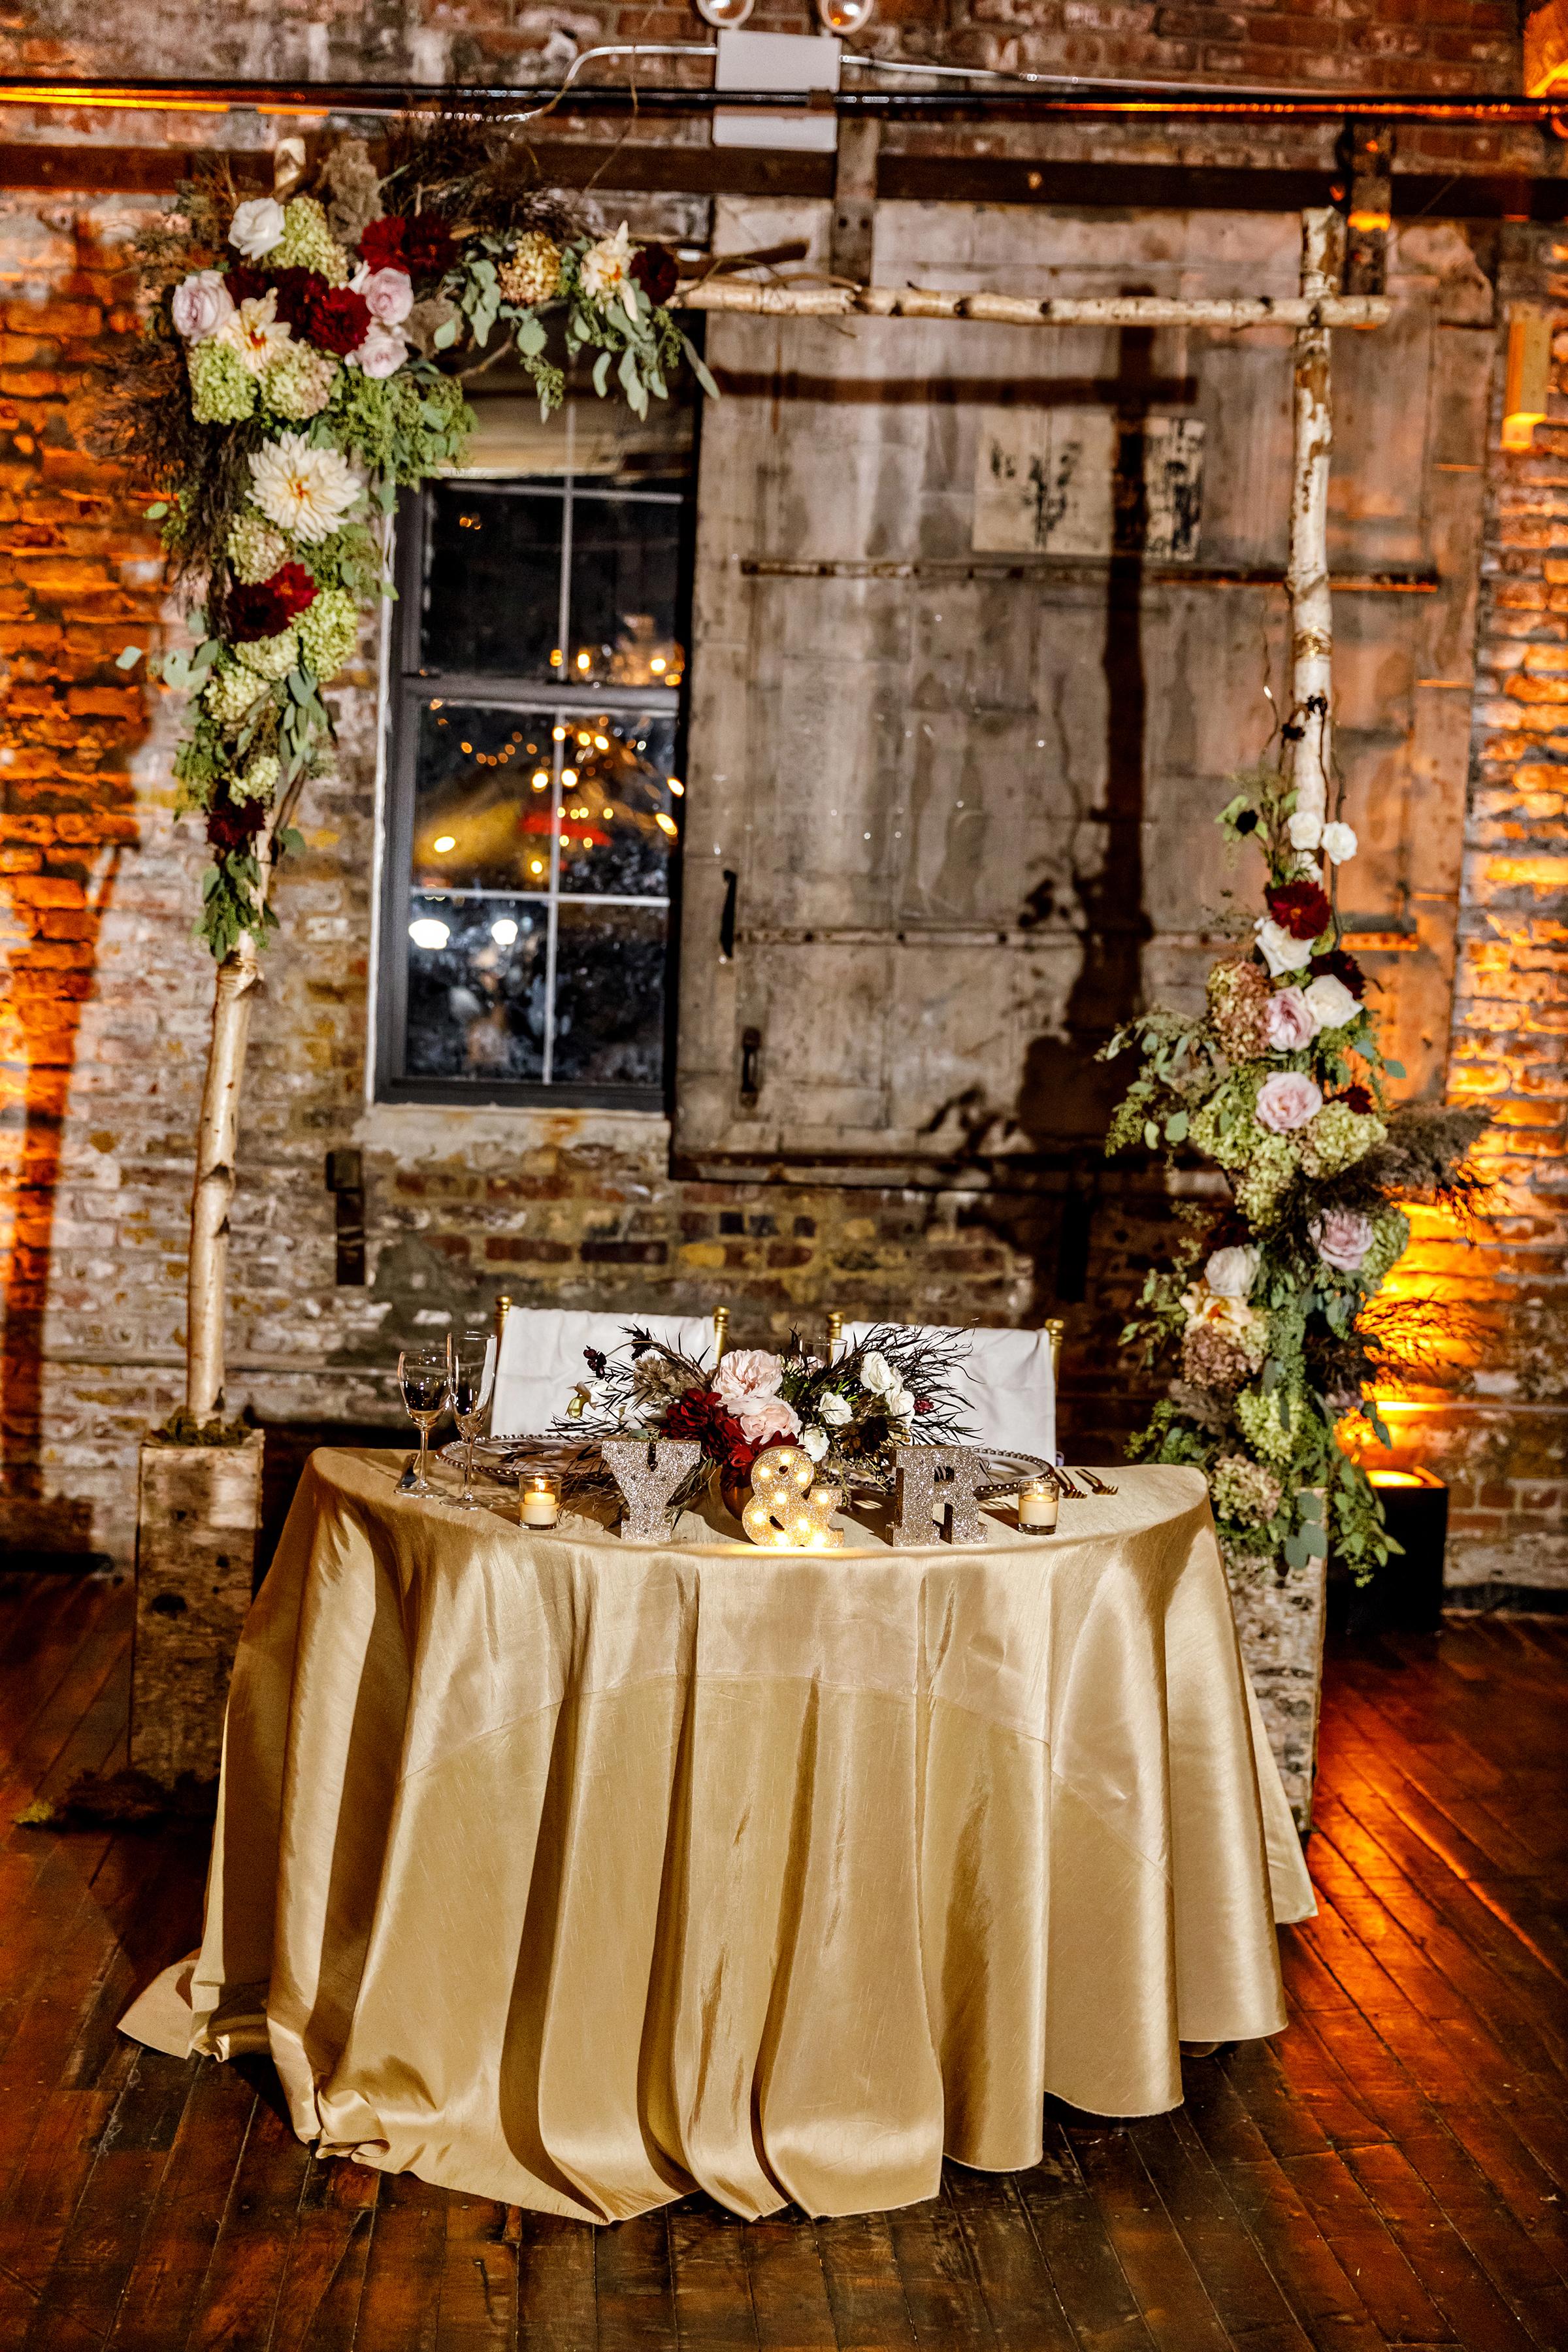 victorious-events-nyc-040-yanique-rondel-greenpoint-loft-wedding-amy-anaiz.jpg